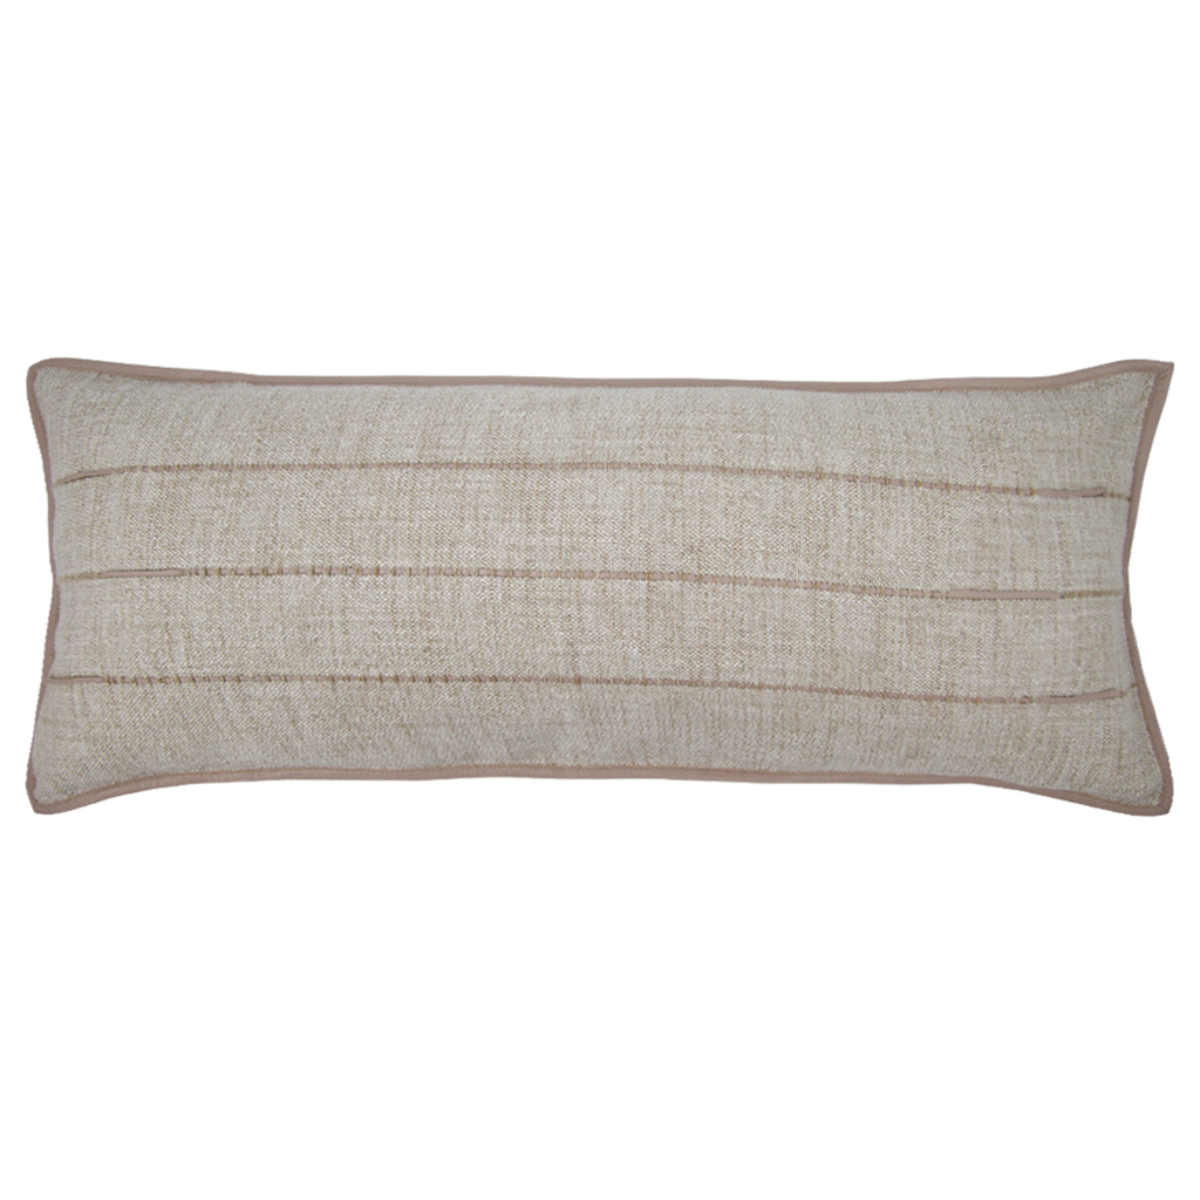 de Le Cuona | Hoxton Sofa Cushion With Leather Detail Flax